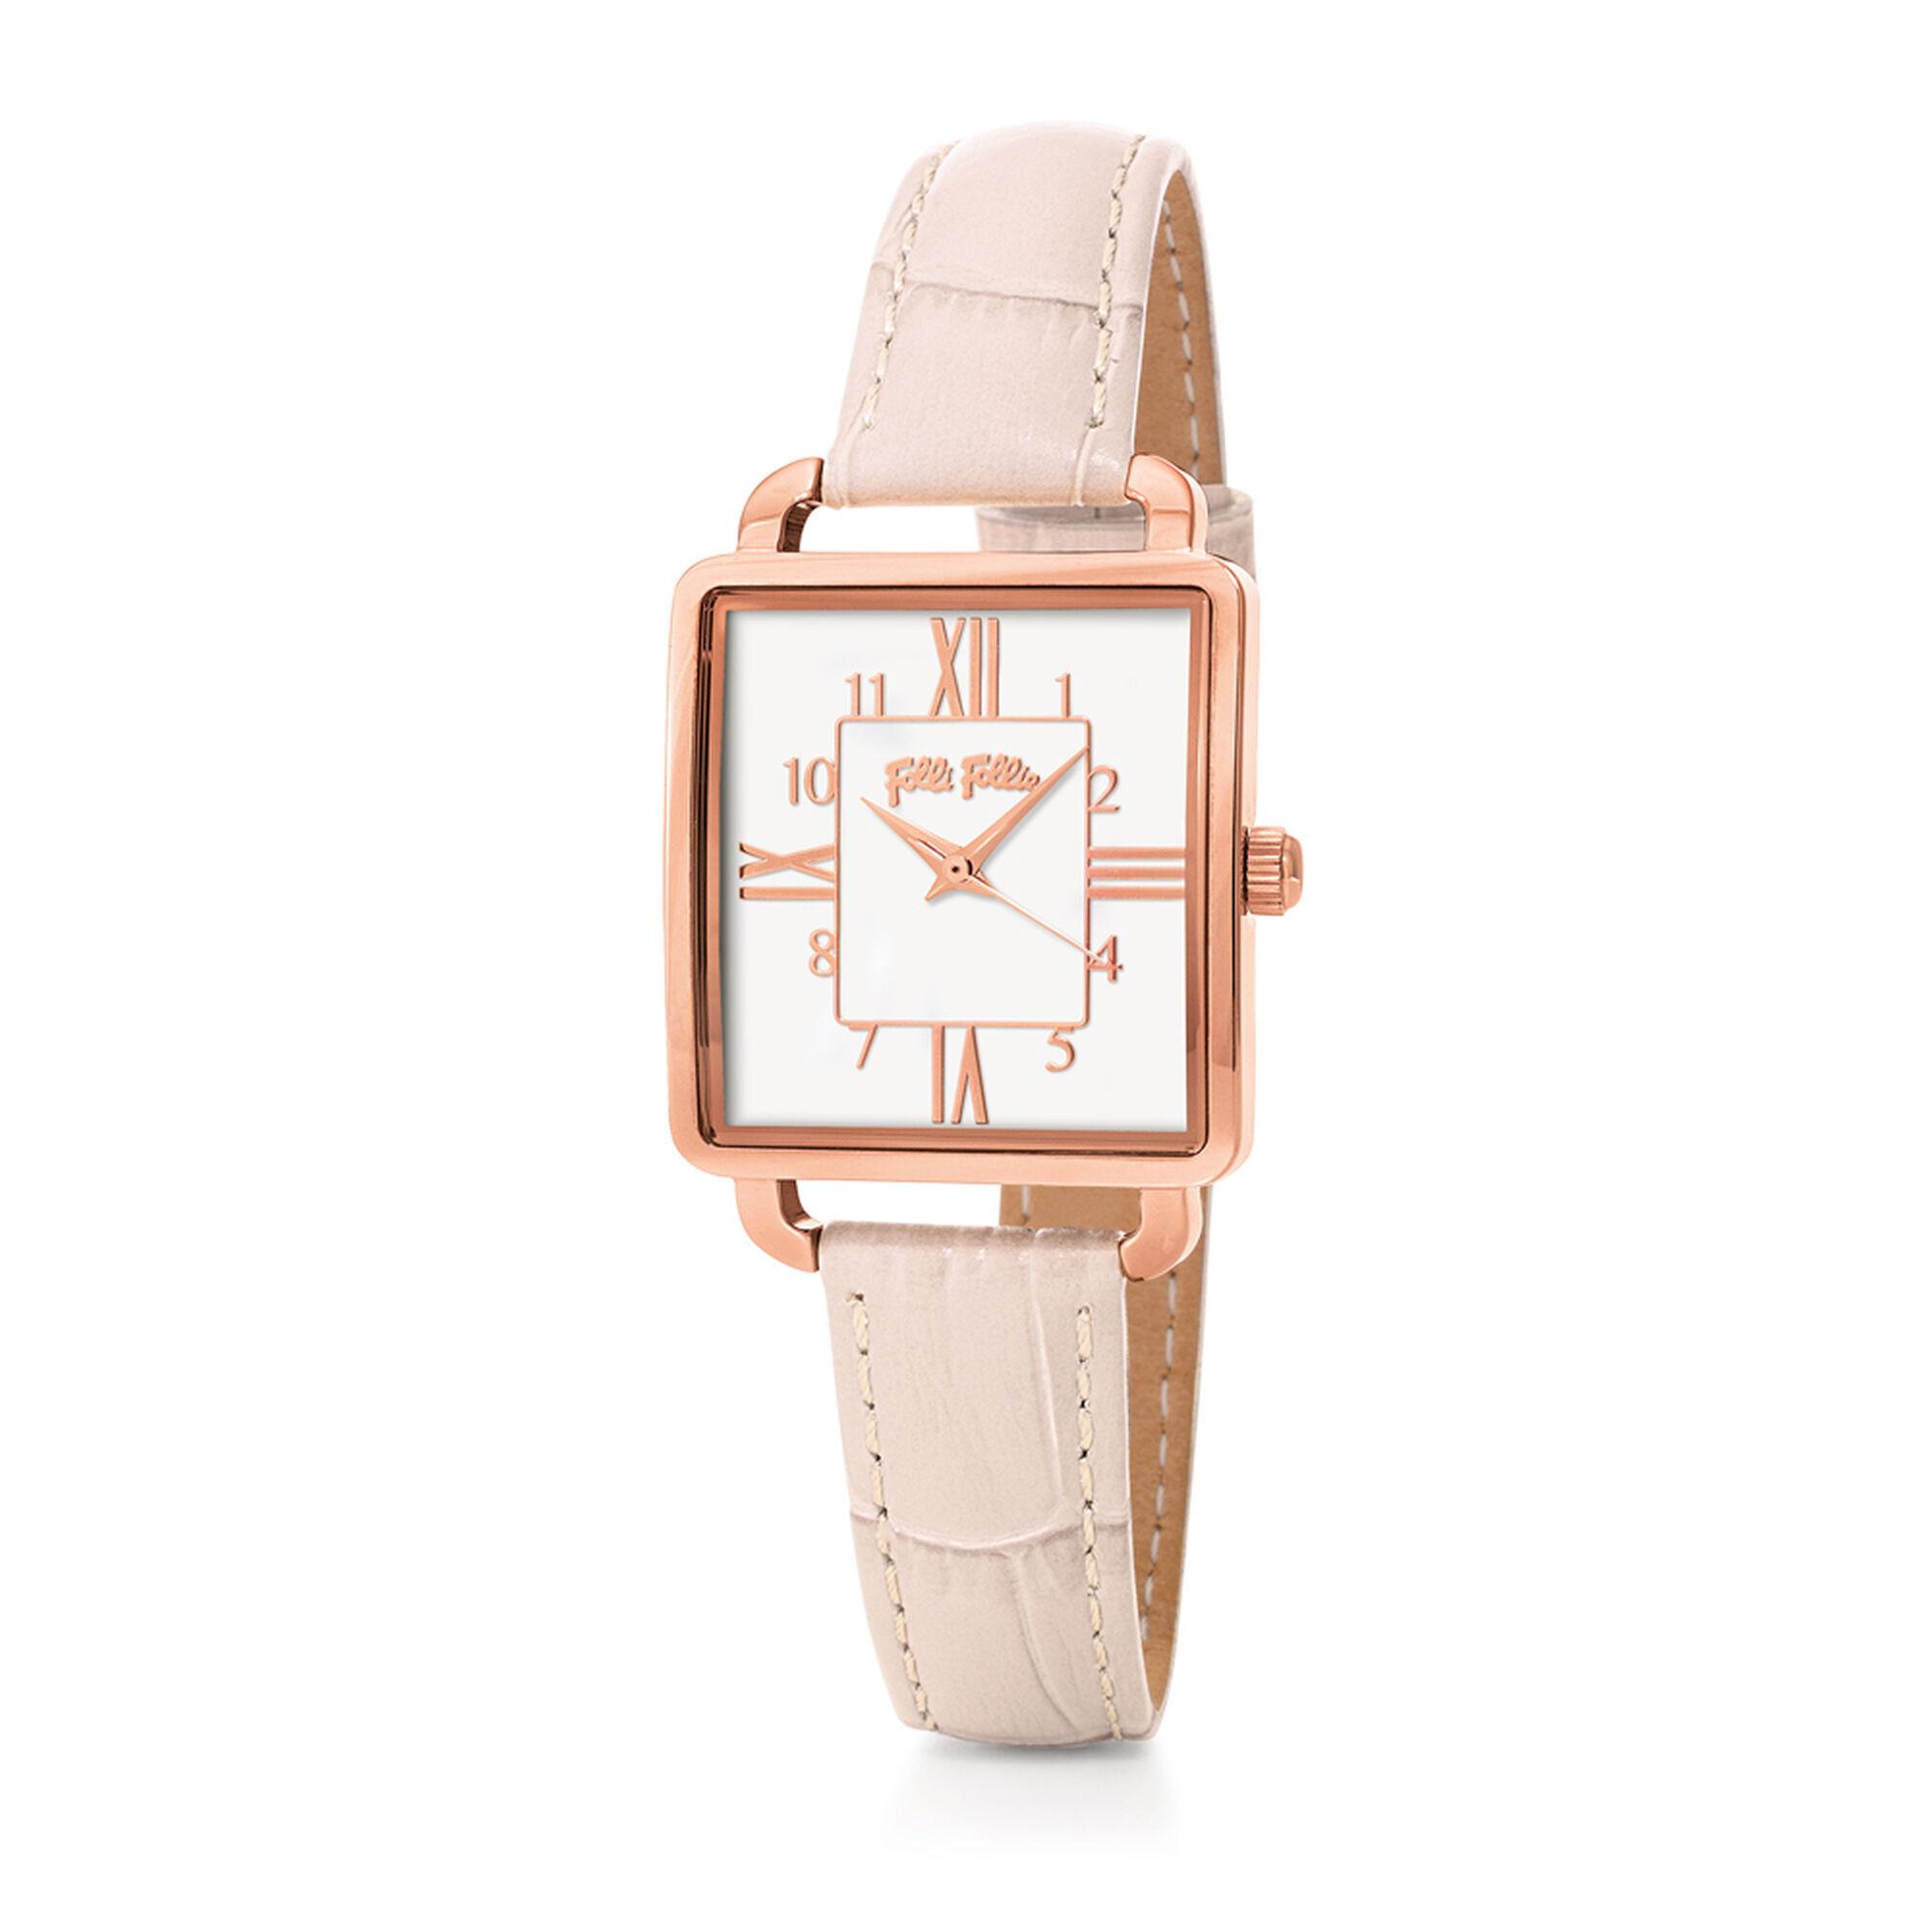 RETRO TIME レザーベルトウォッチ/腕時計